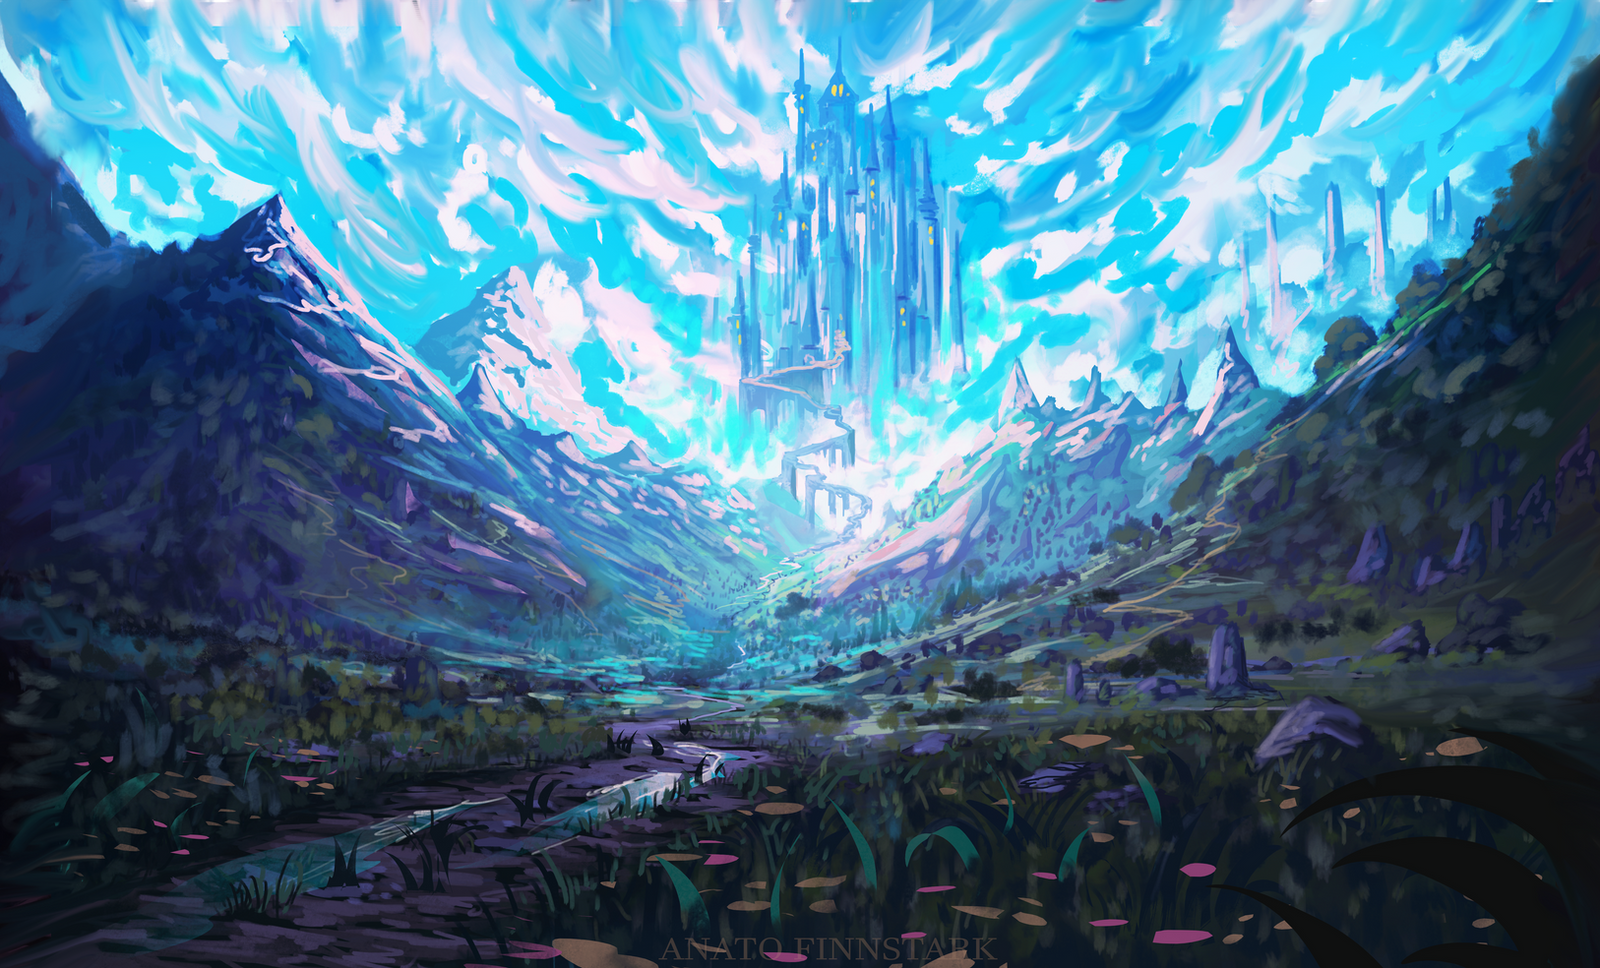 The high castle by AnatoFinnstark